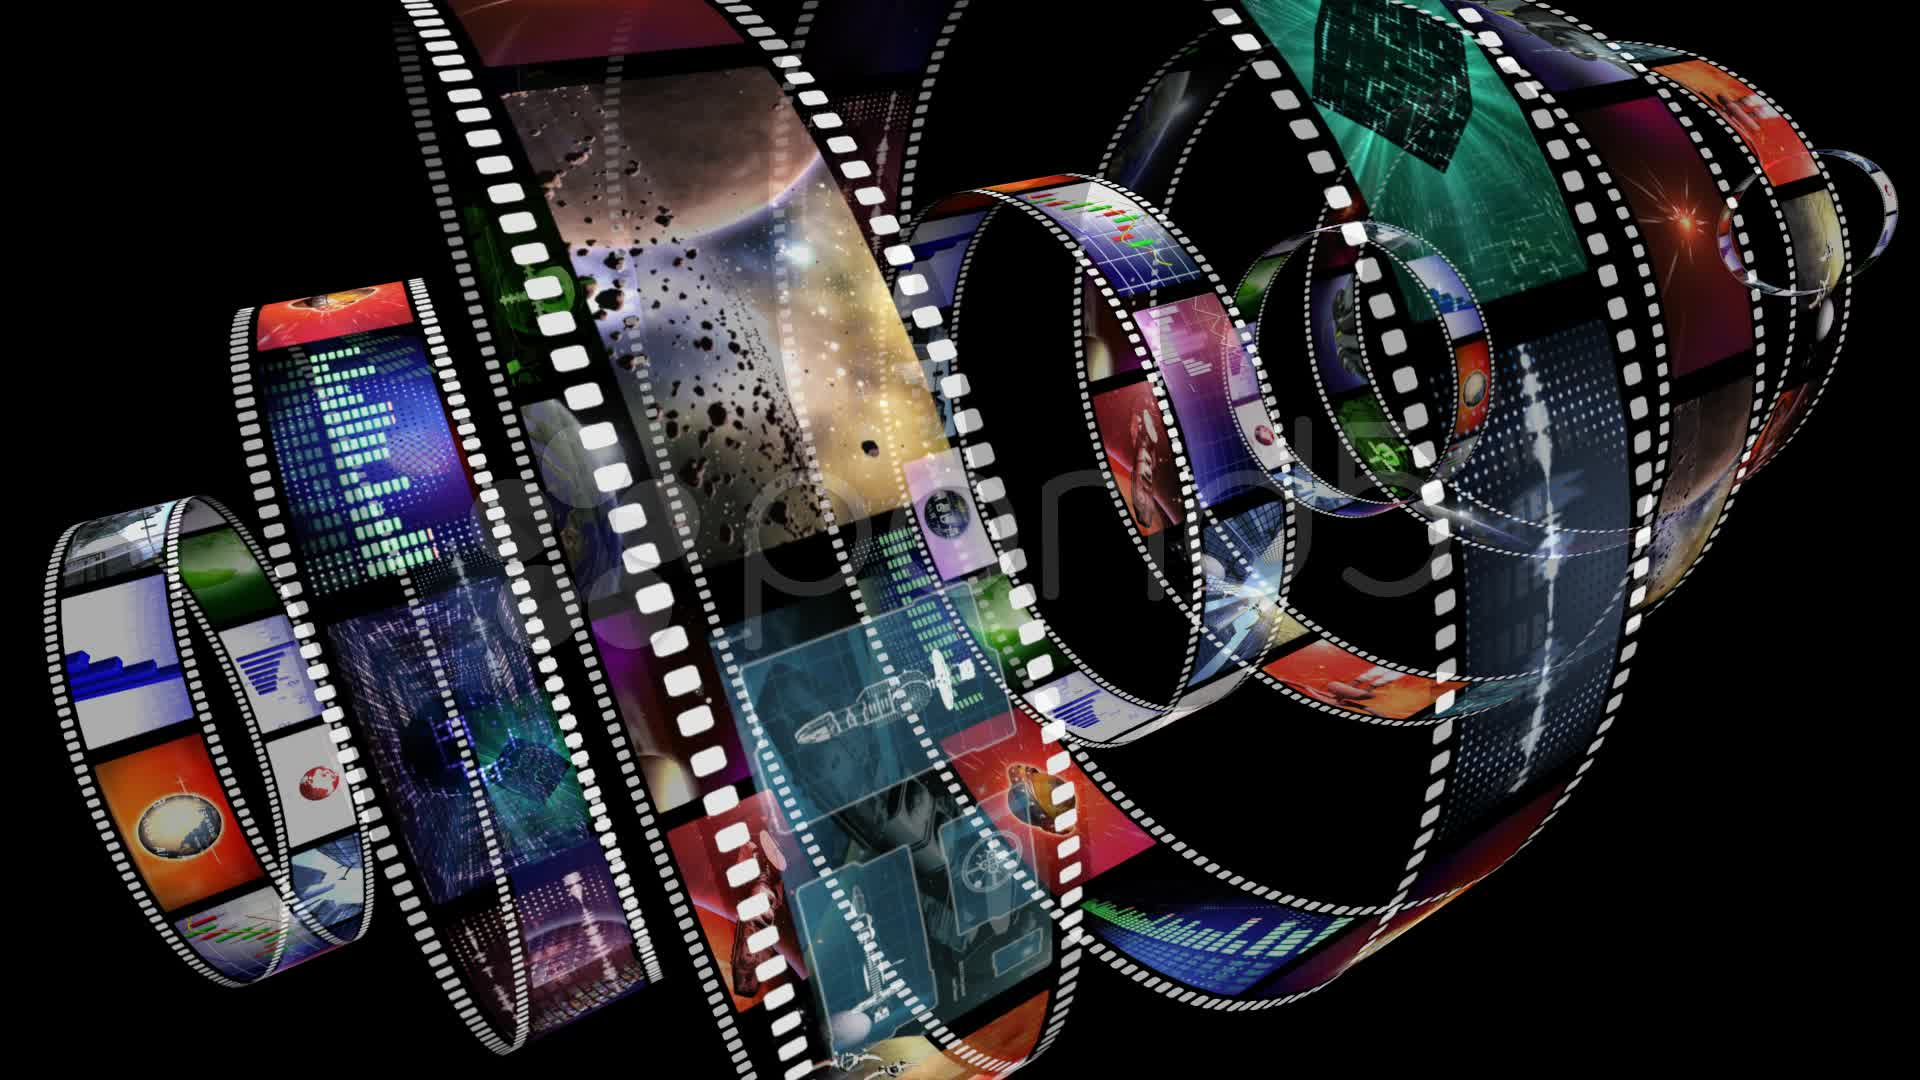 Download Movie Reel Wallpaper Hd Backgrounds Download Itlcat